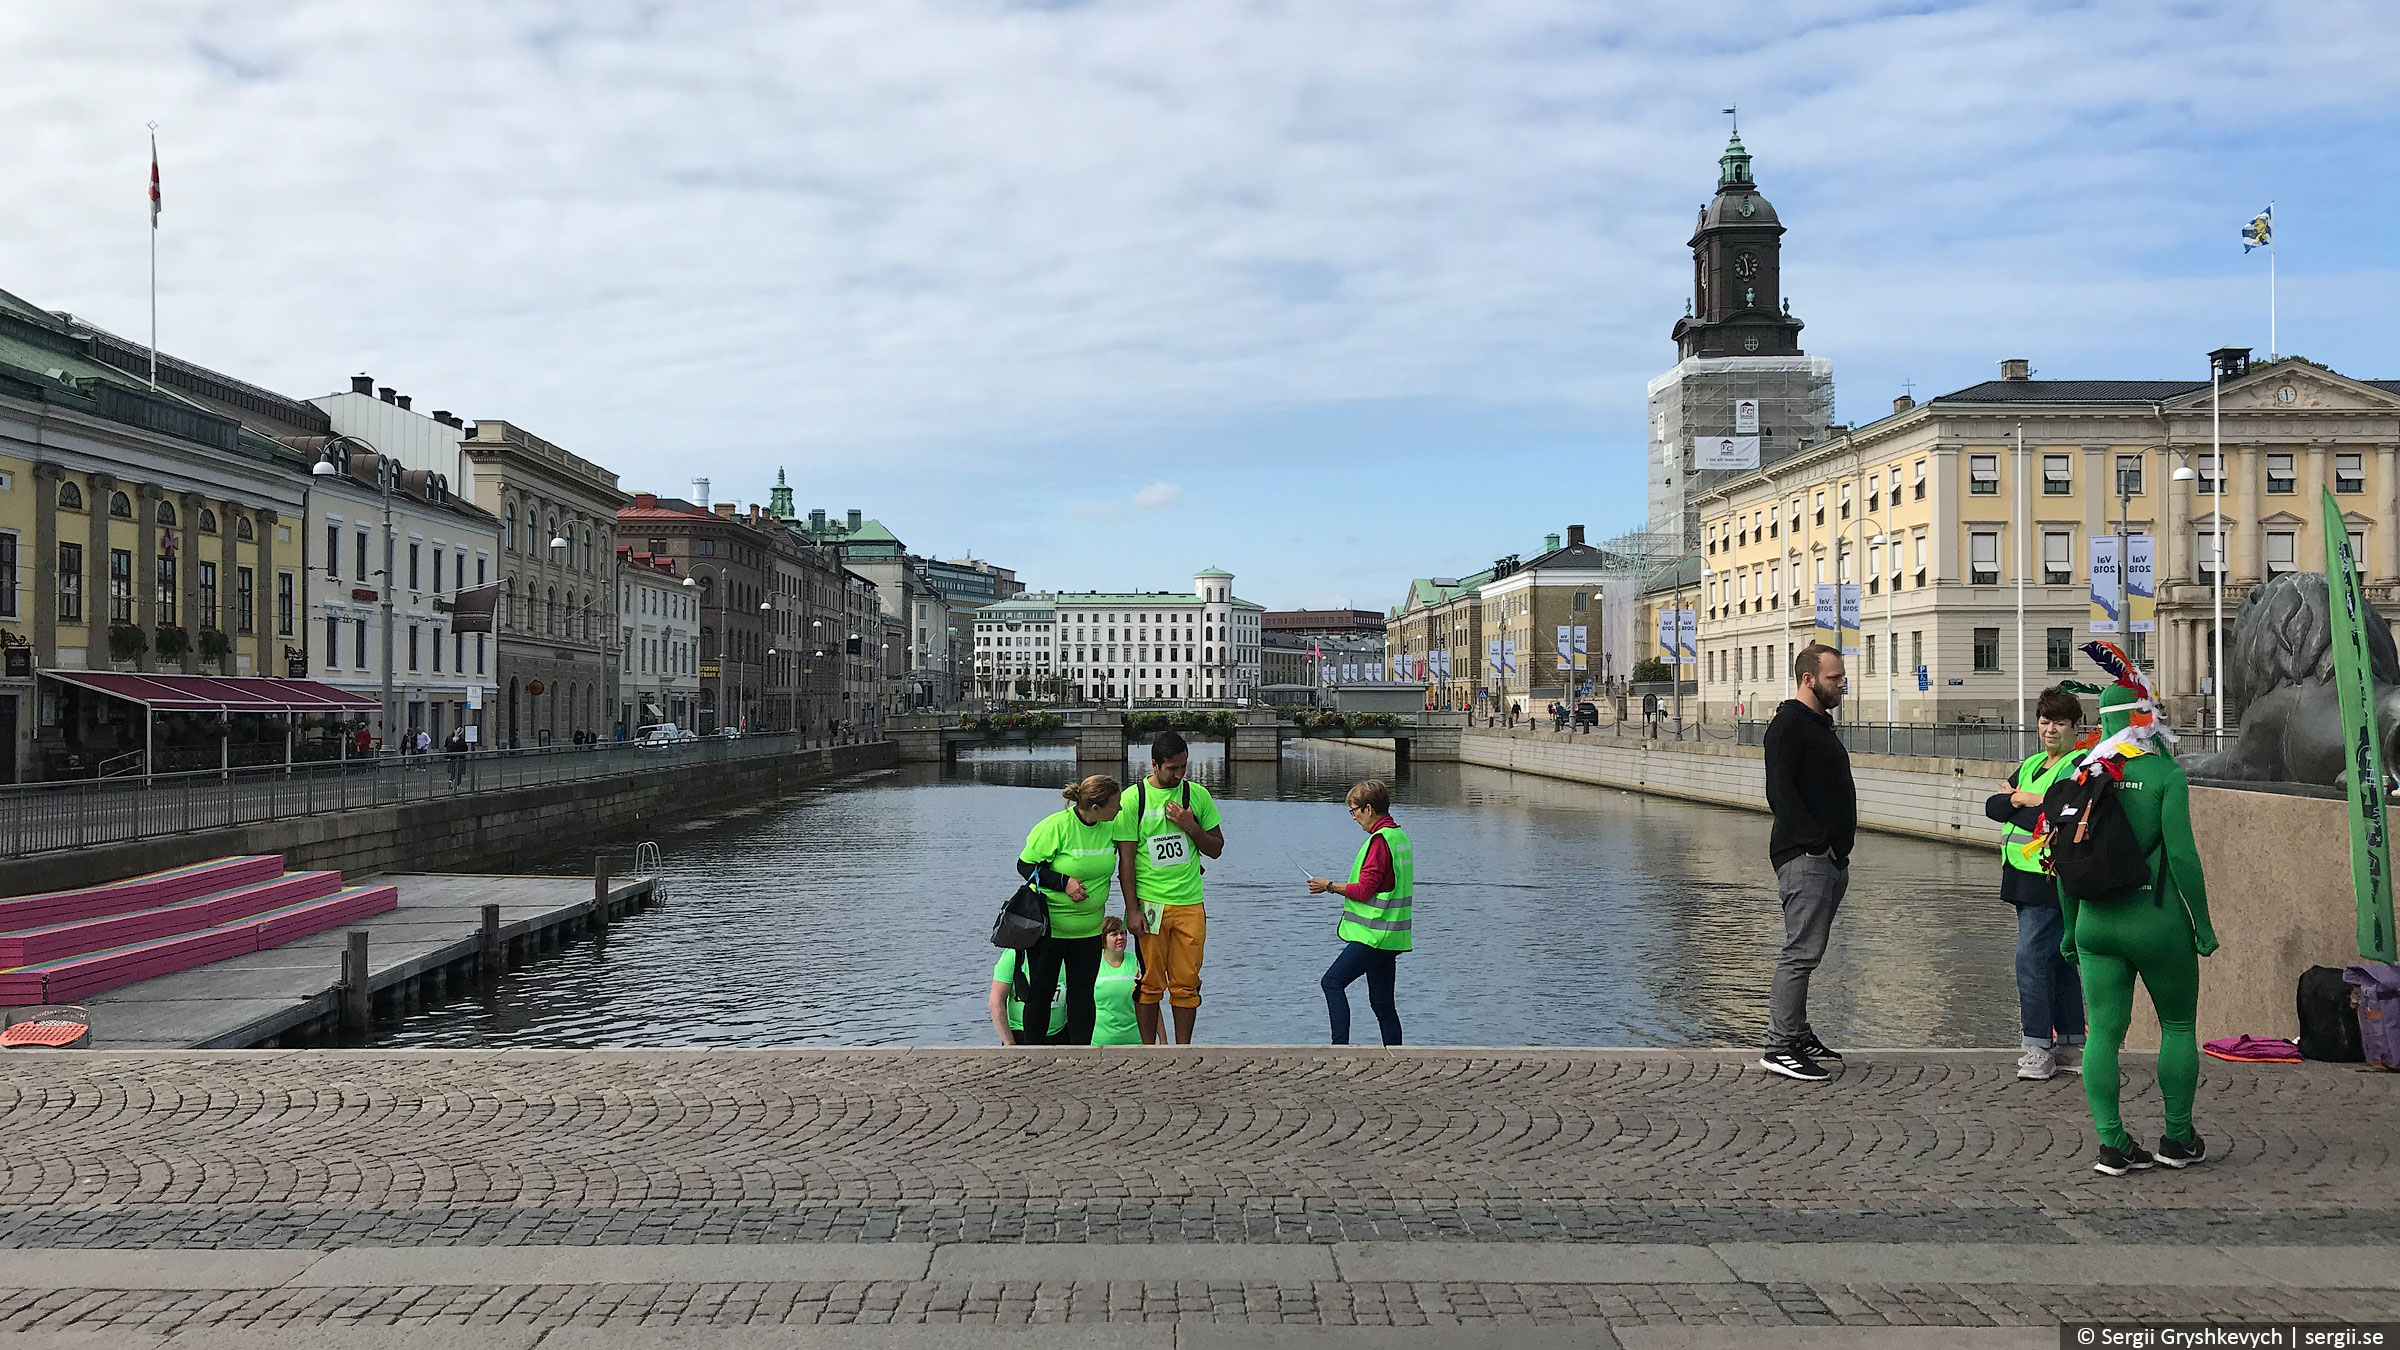 göteborg-ghotenburg-sweden-2018-21